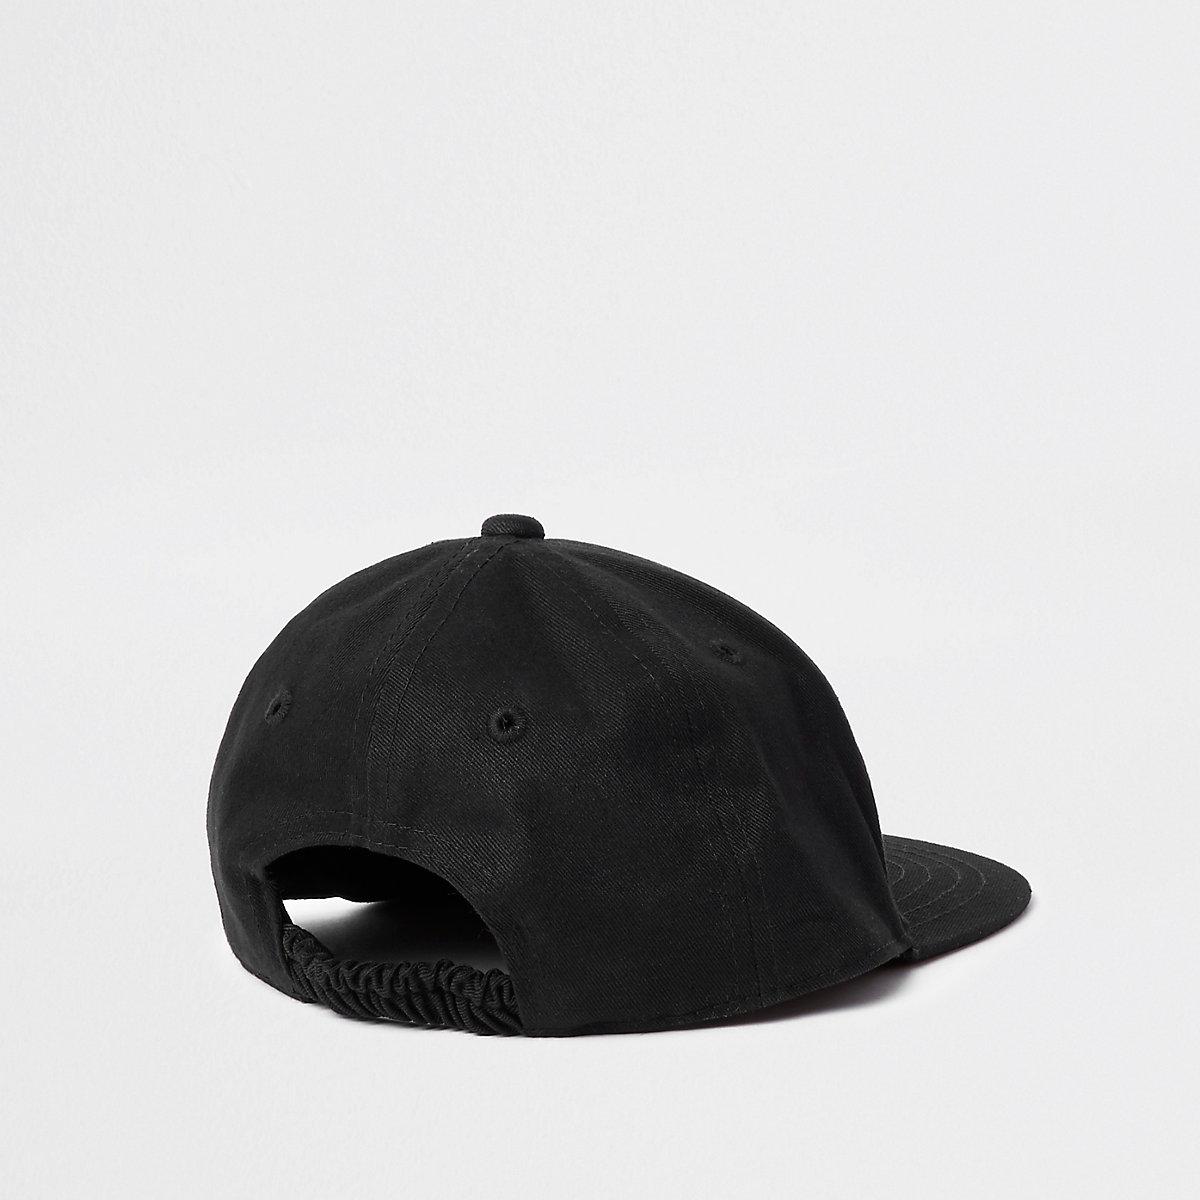 Mini boys black  NYC  sunset flat cap - Baby Boys Accessories - Mini ... f16a97a2375